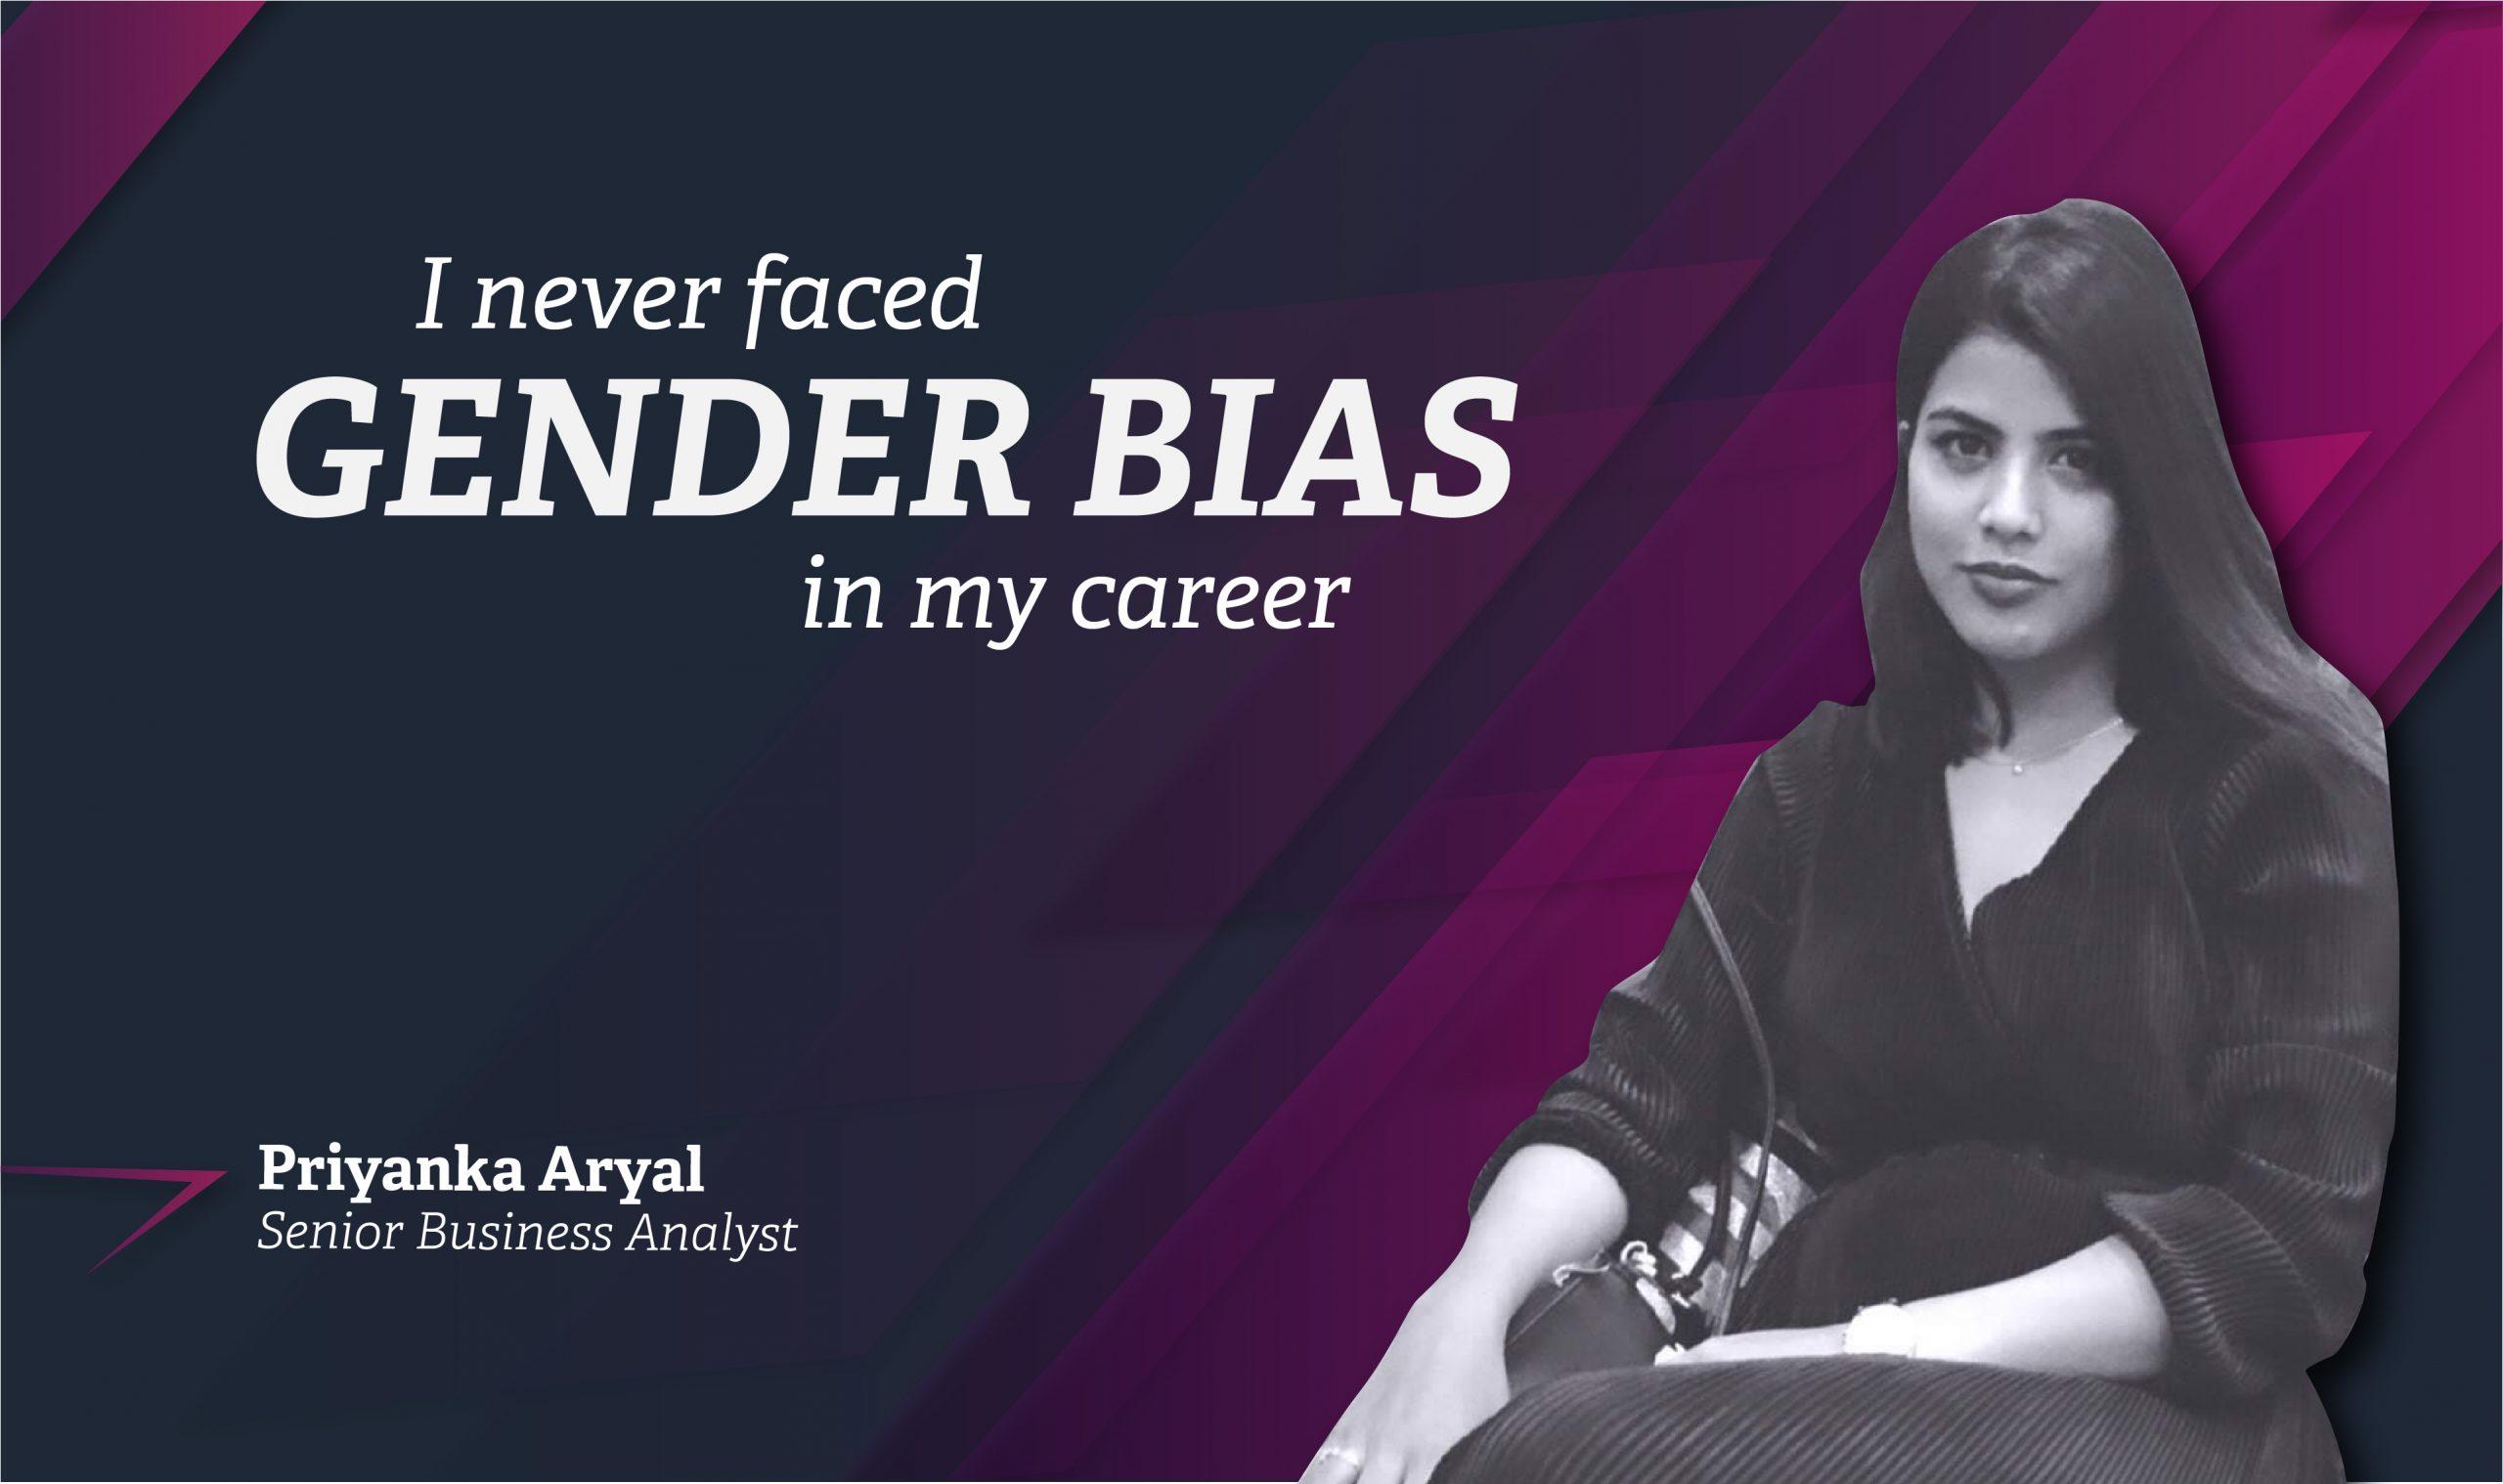 I never faced GENDER BIAS in my career: Priyanka Aryal